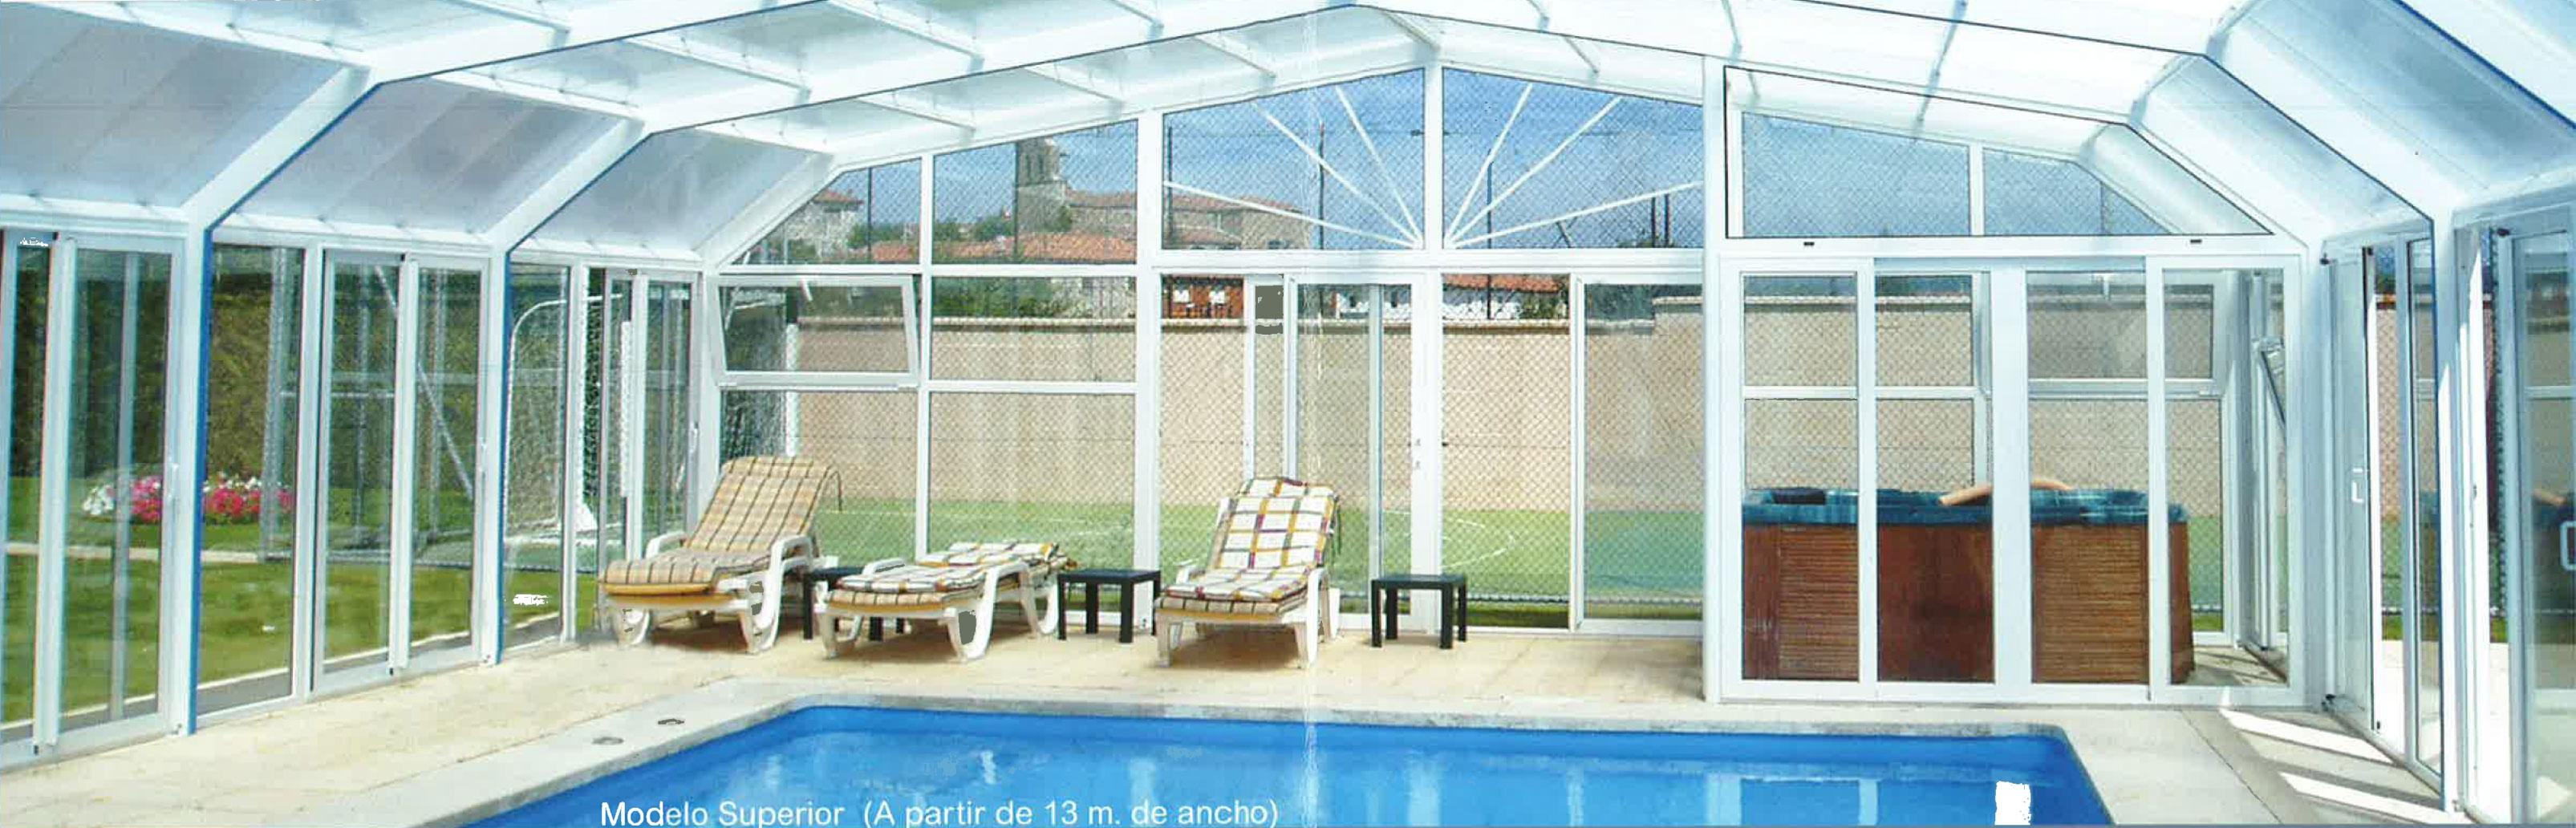 cubierta-piscina-1